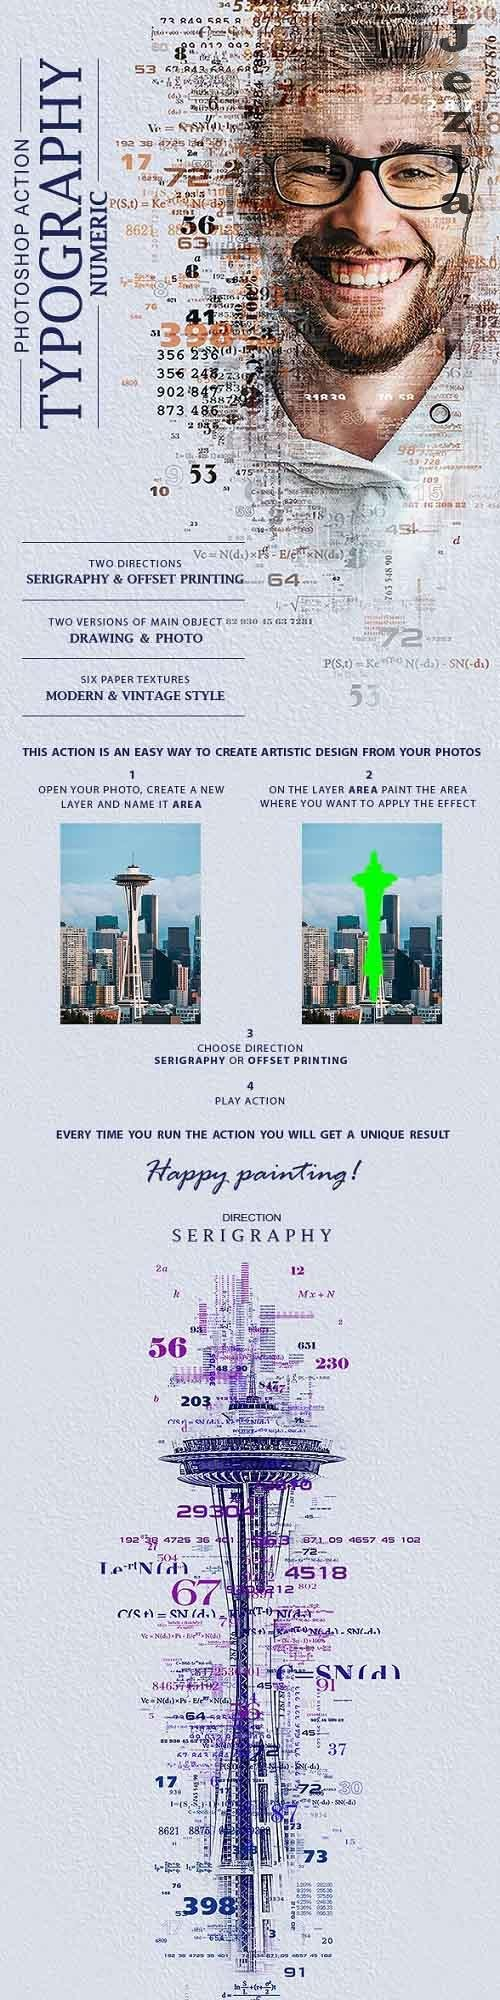 GraphicRiver - Typography (Numeric) Photoshop Action 28477619